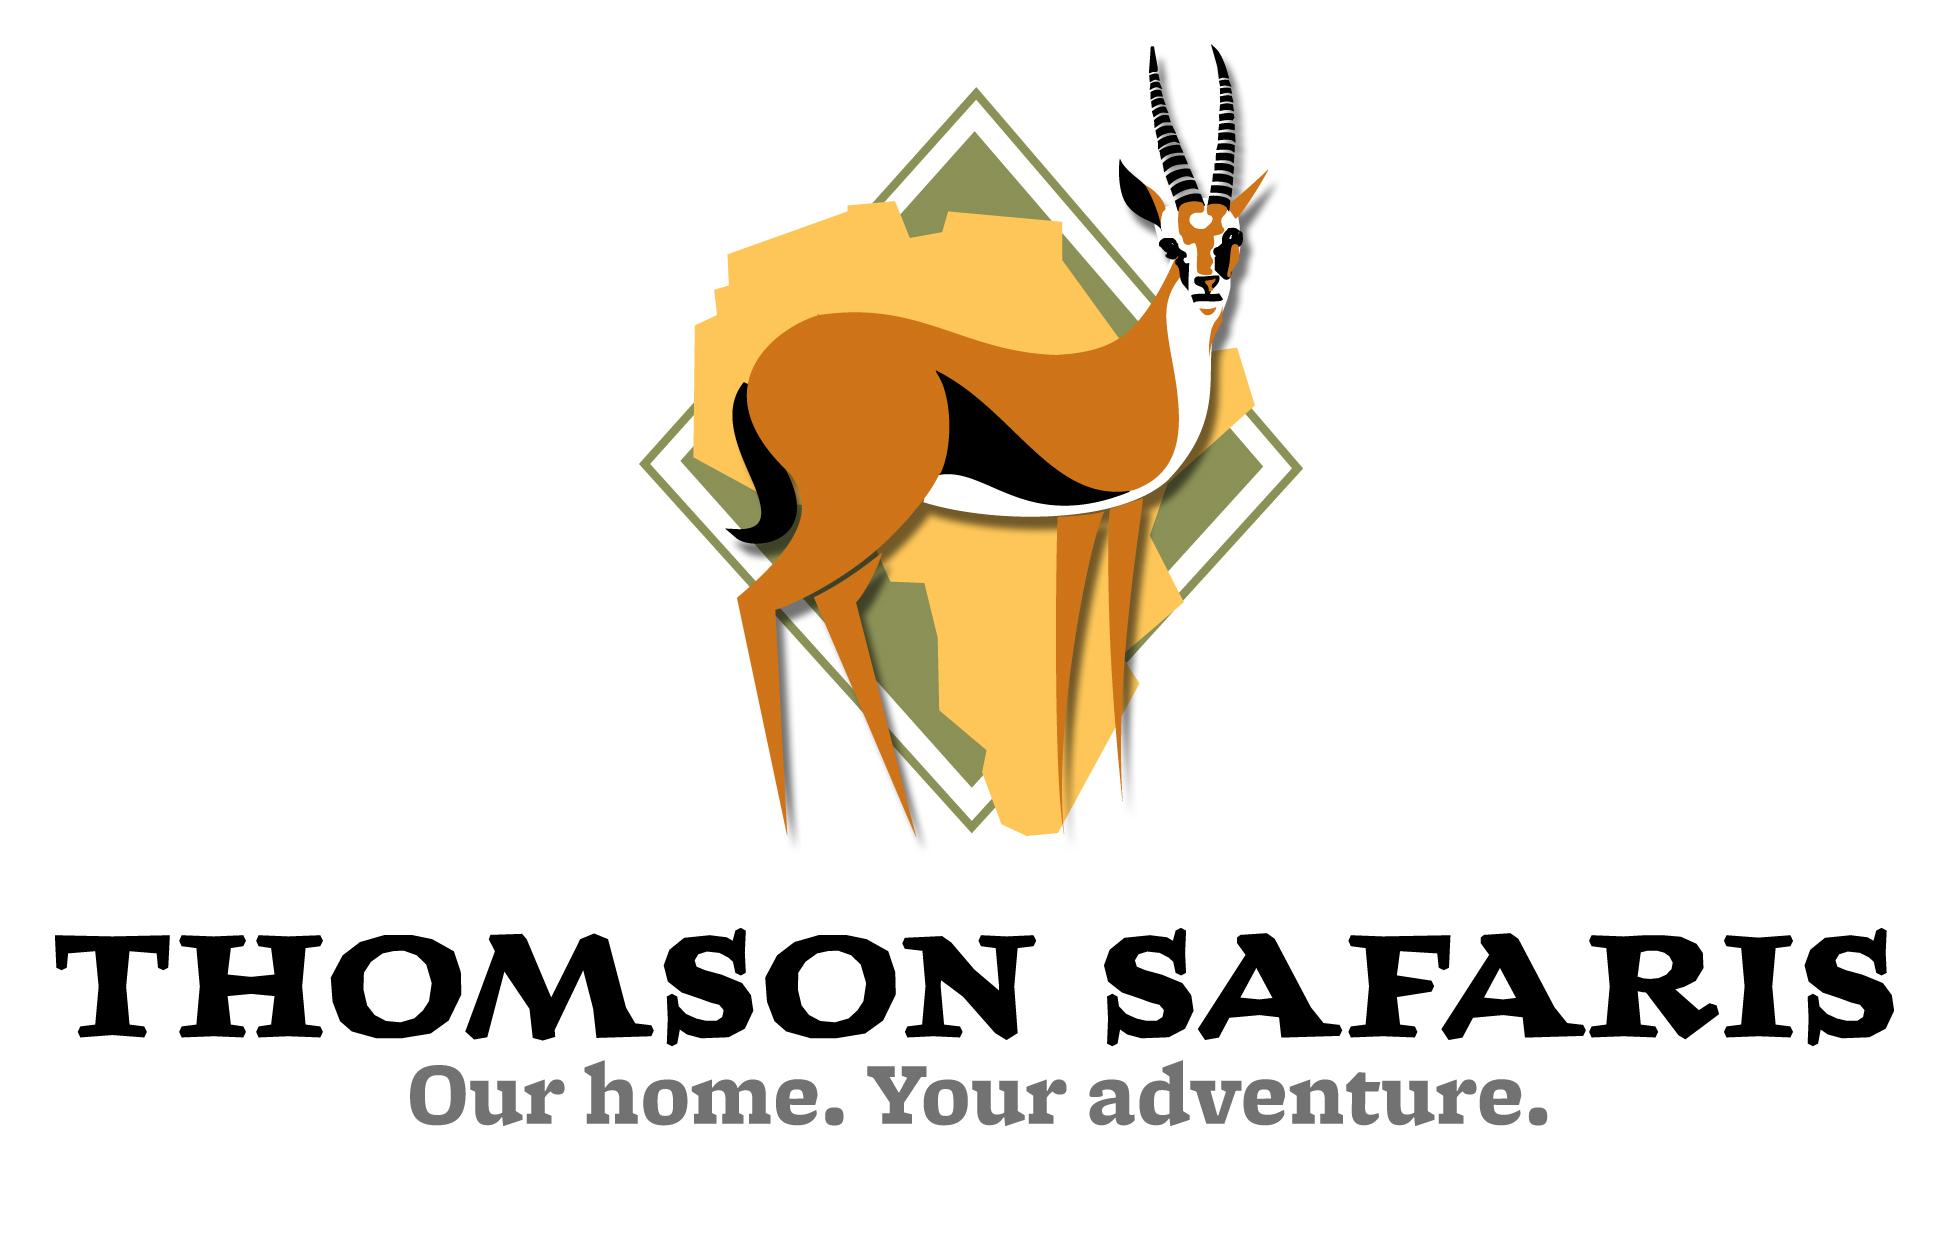 Thomson-Safaris-company-logo